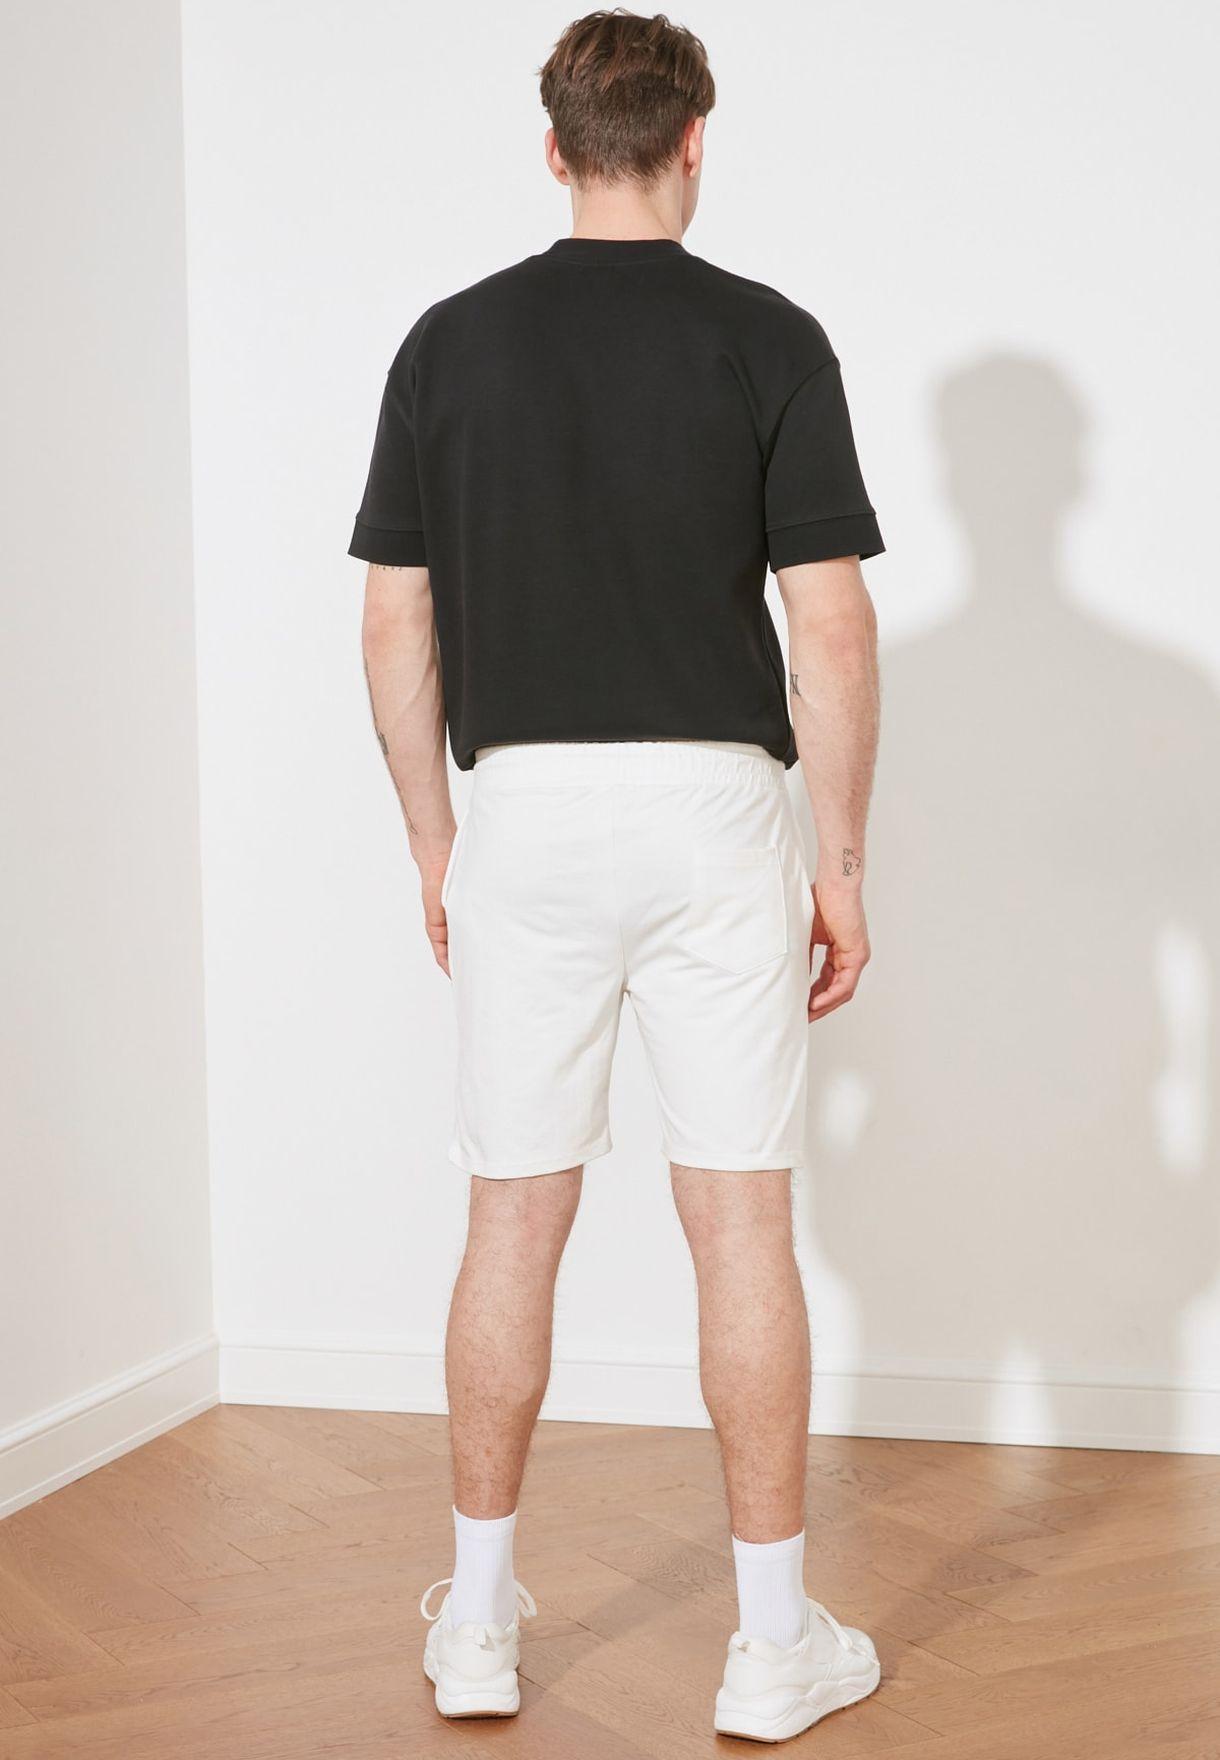 Stripe Detail Shorts